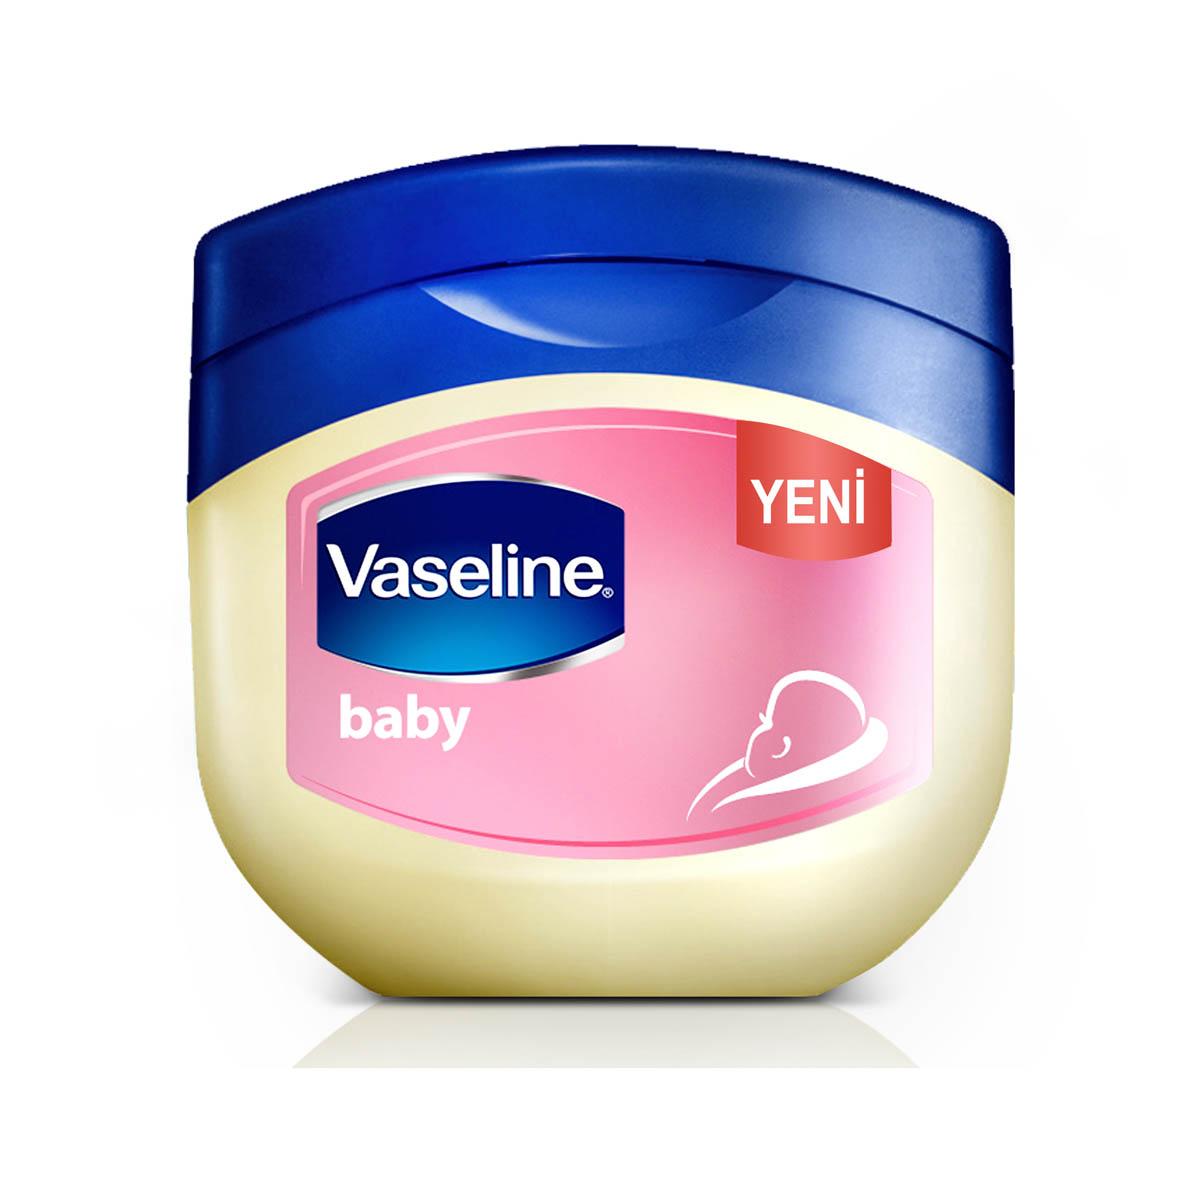 Vaseline Jel Krem Baby 100 Ml A101